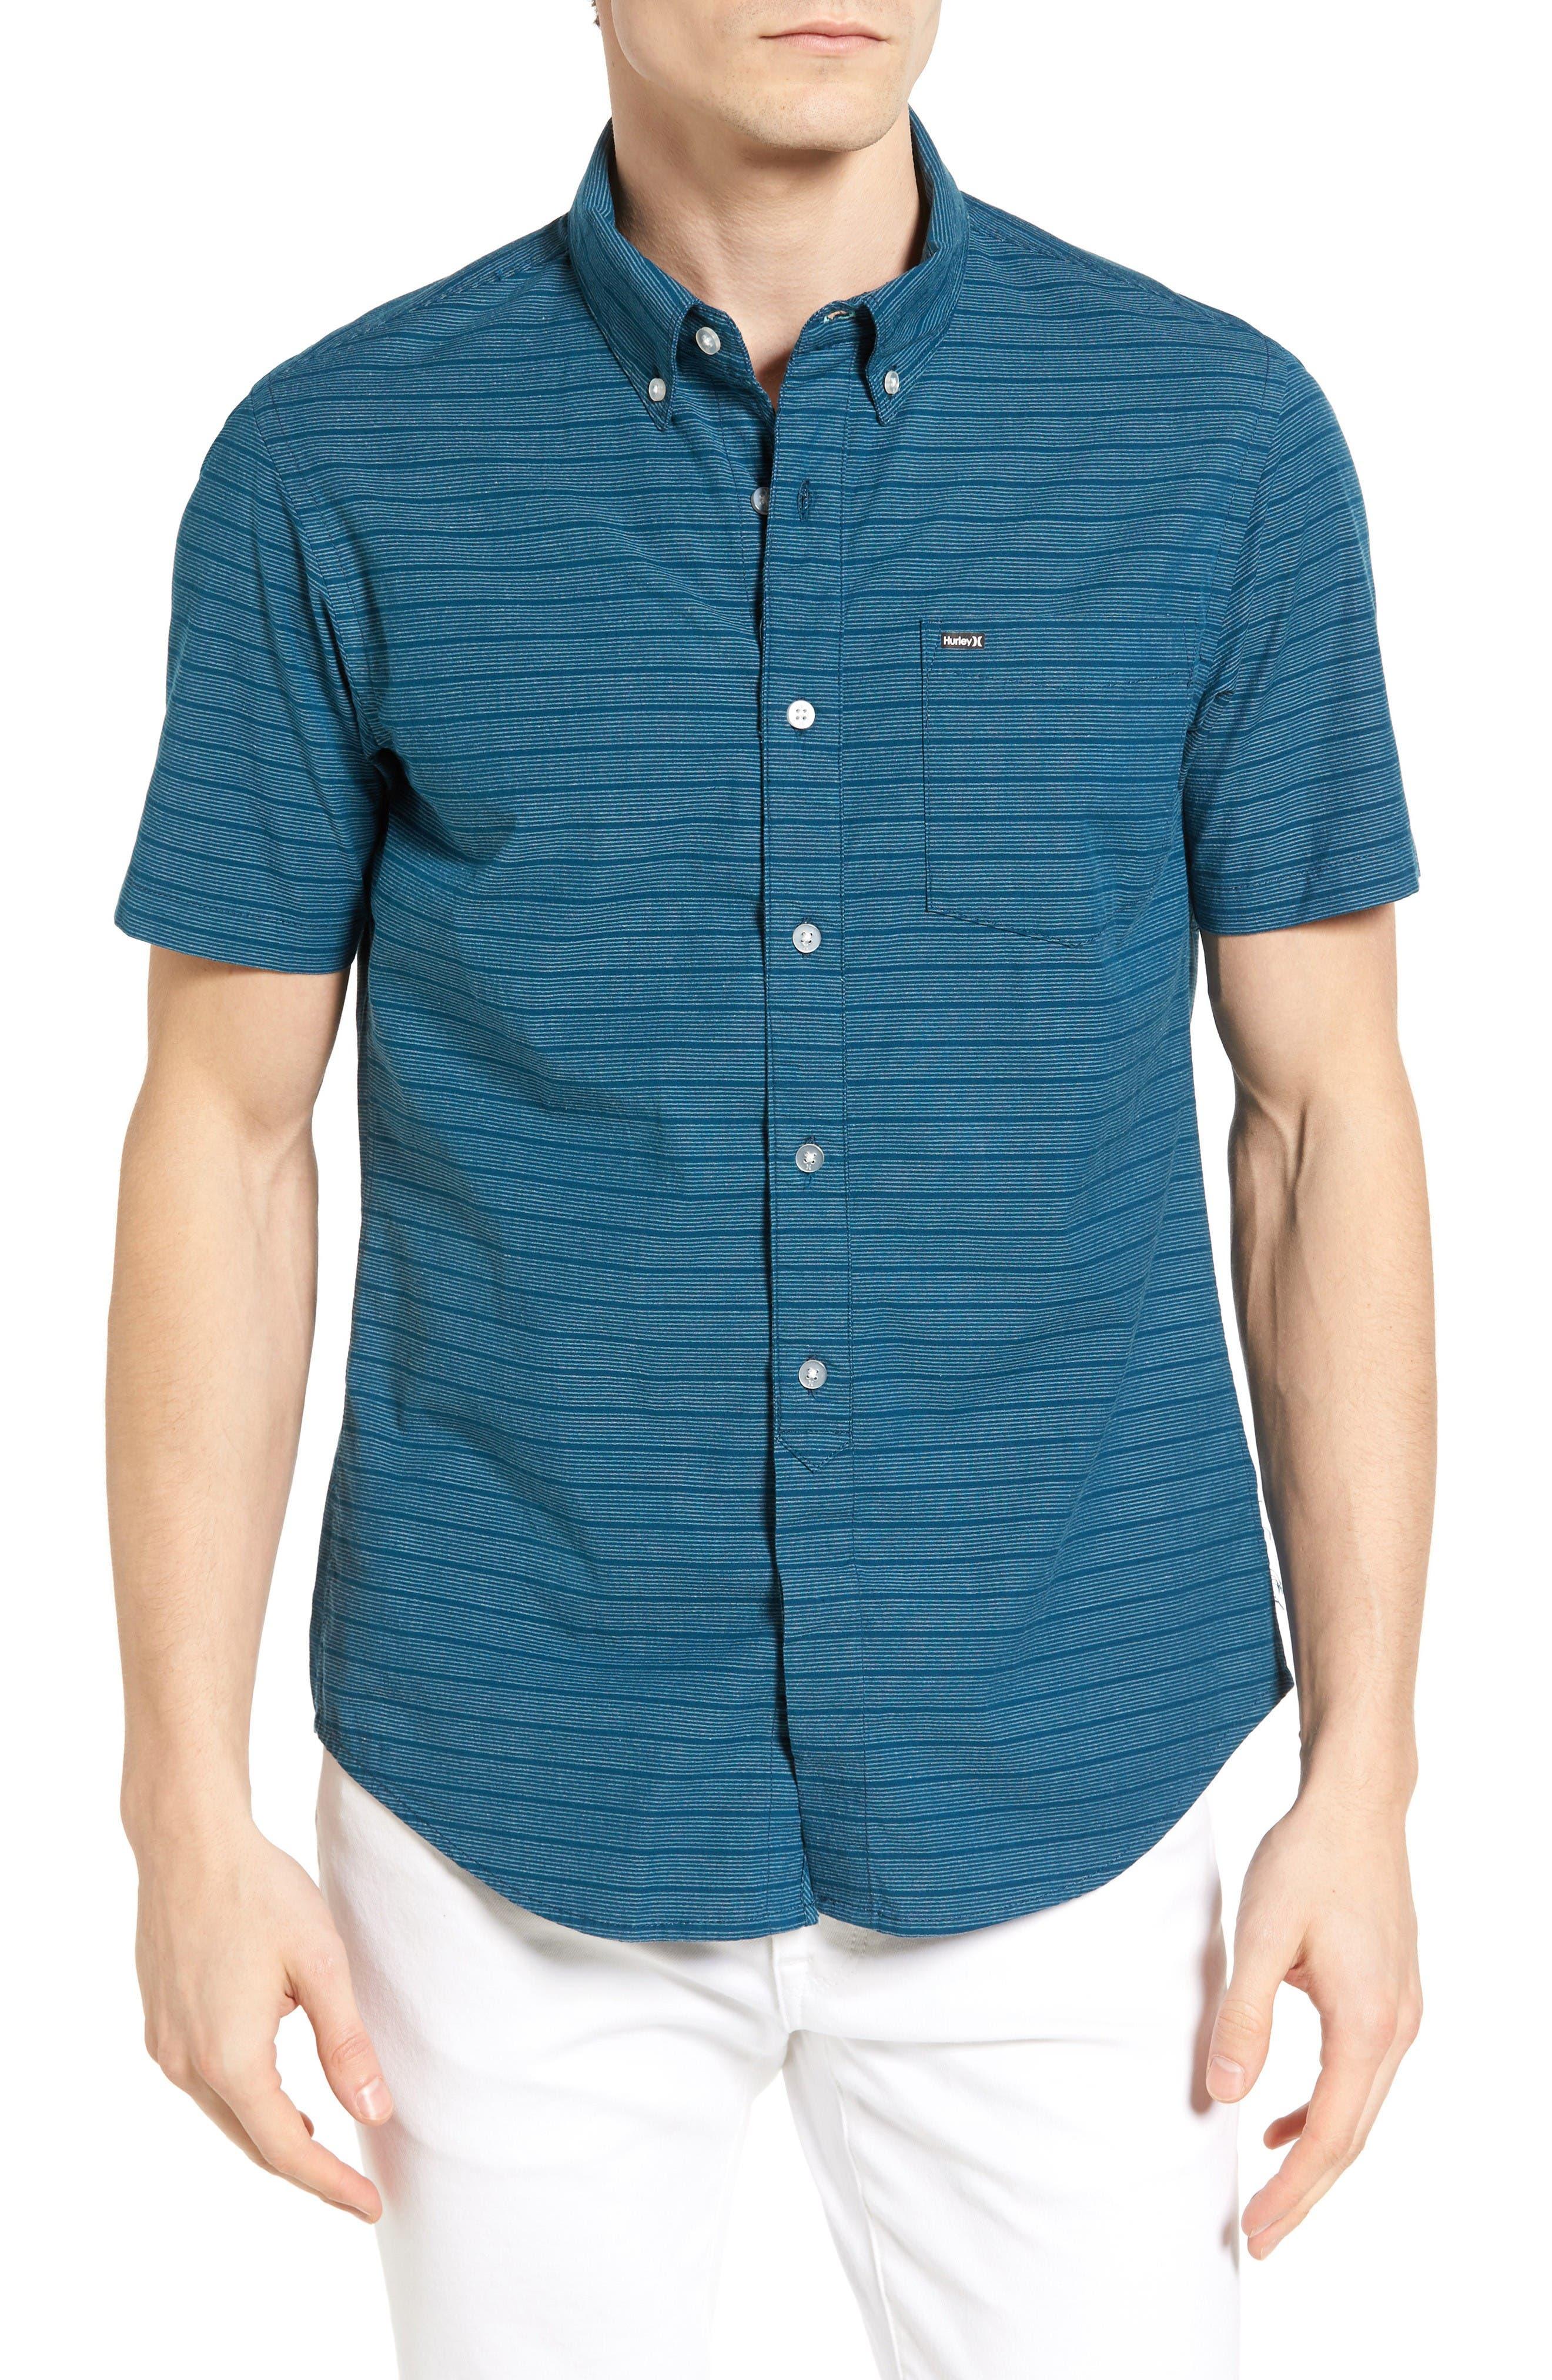 HURLEY Riser Striped Woven Shirt